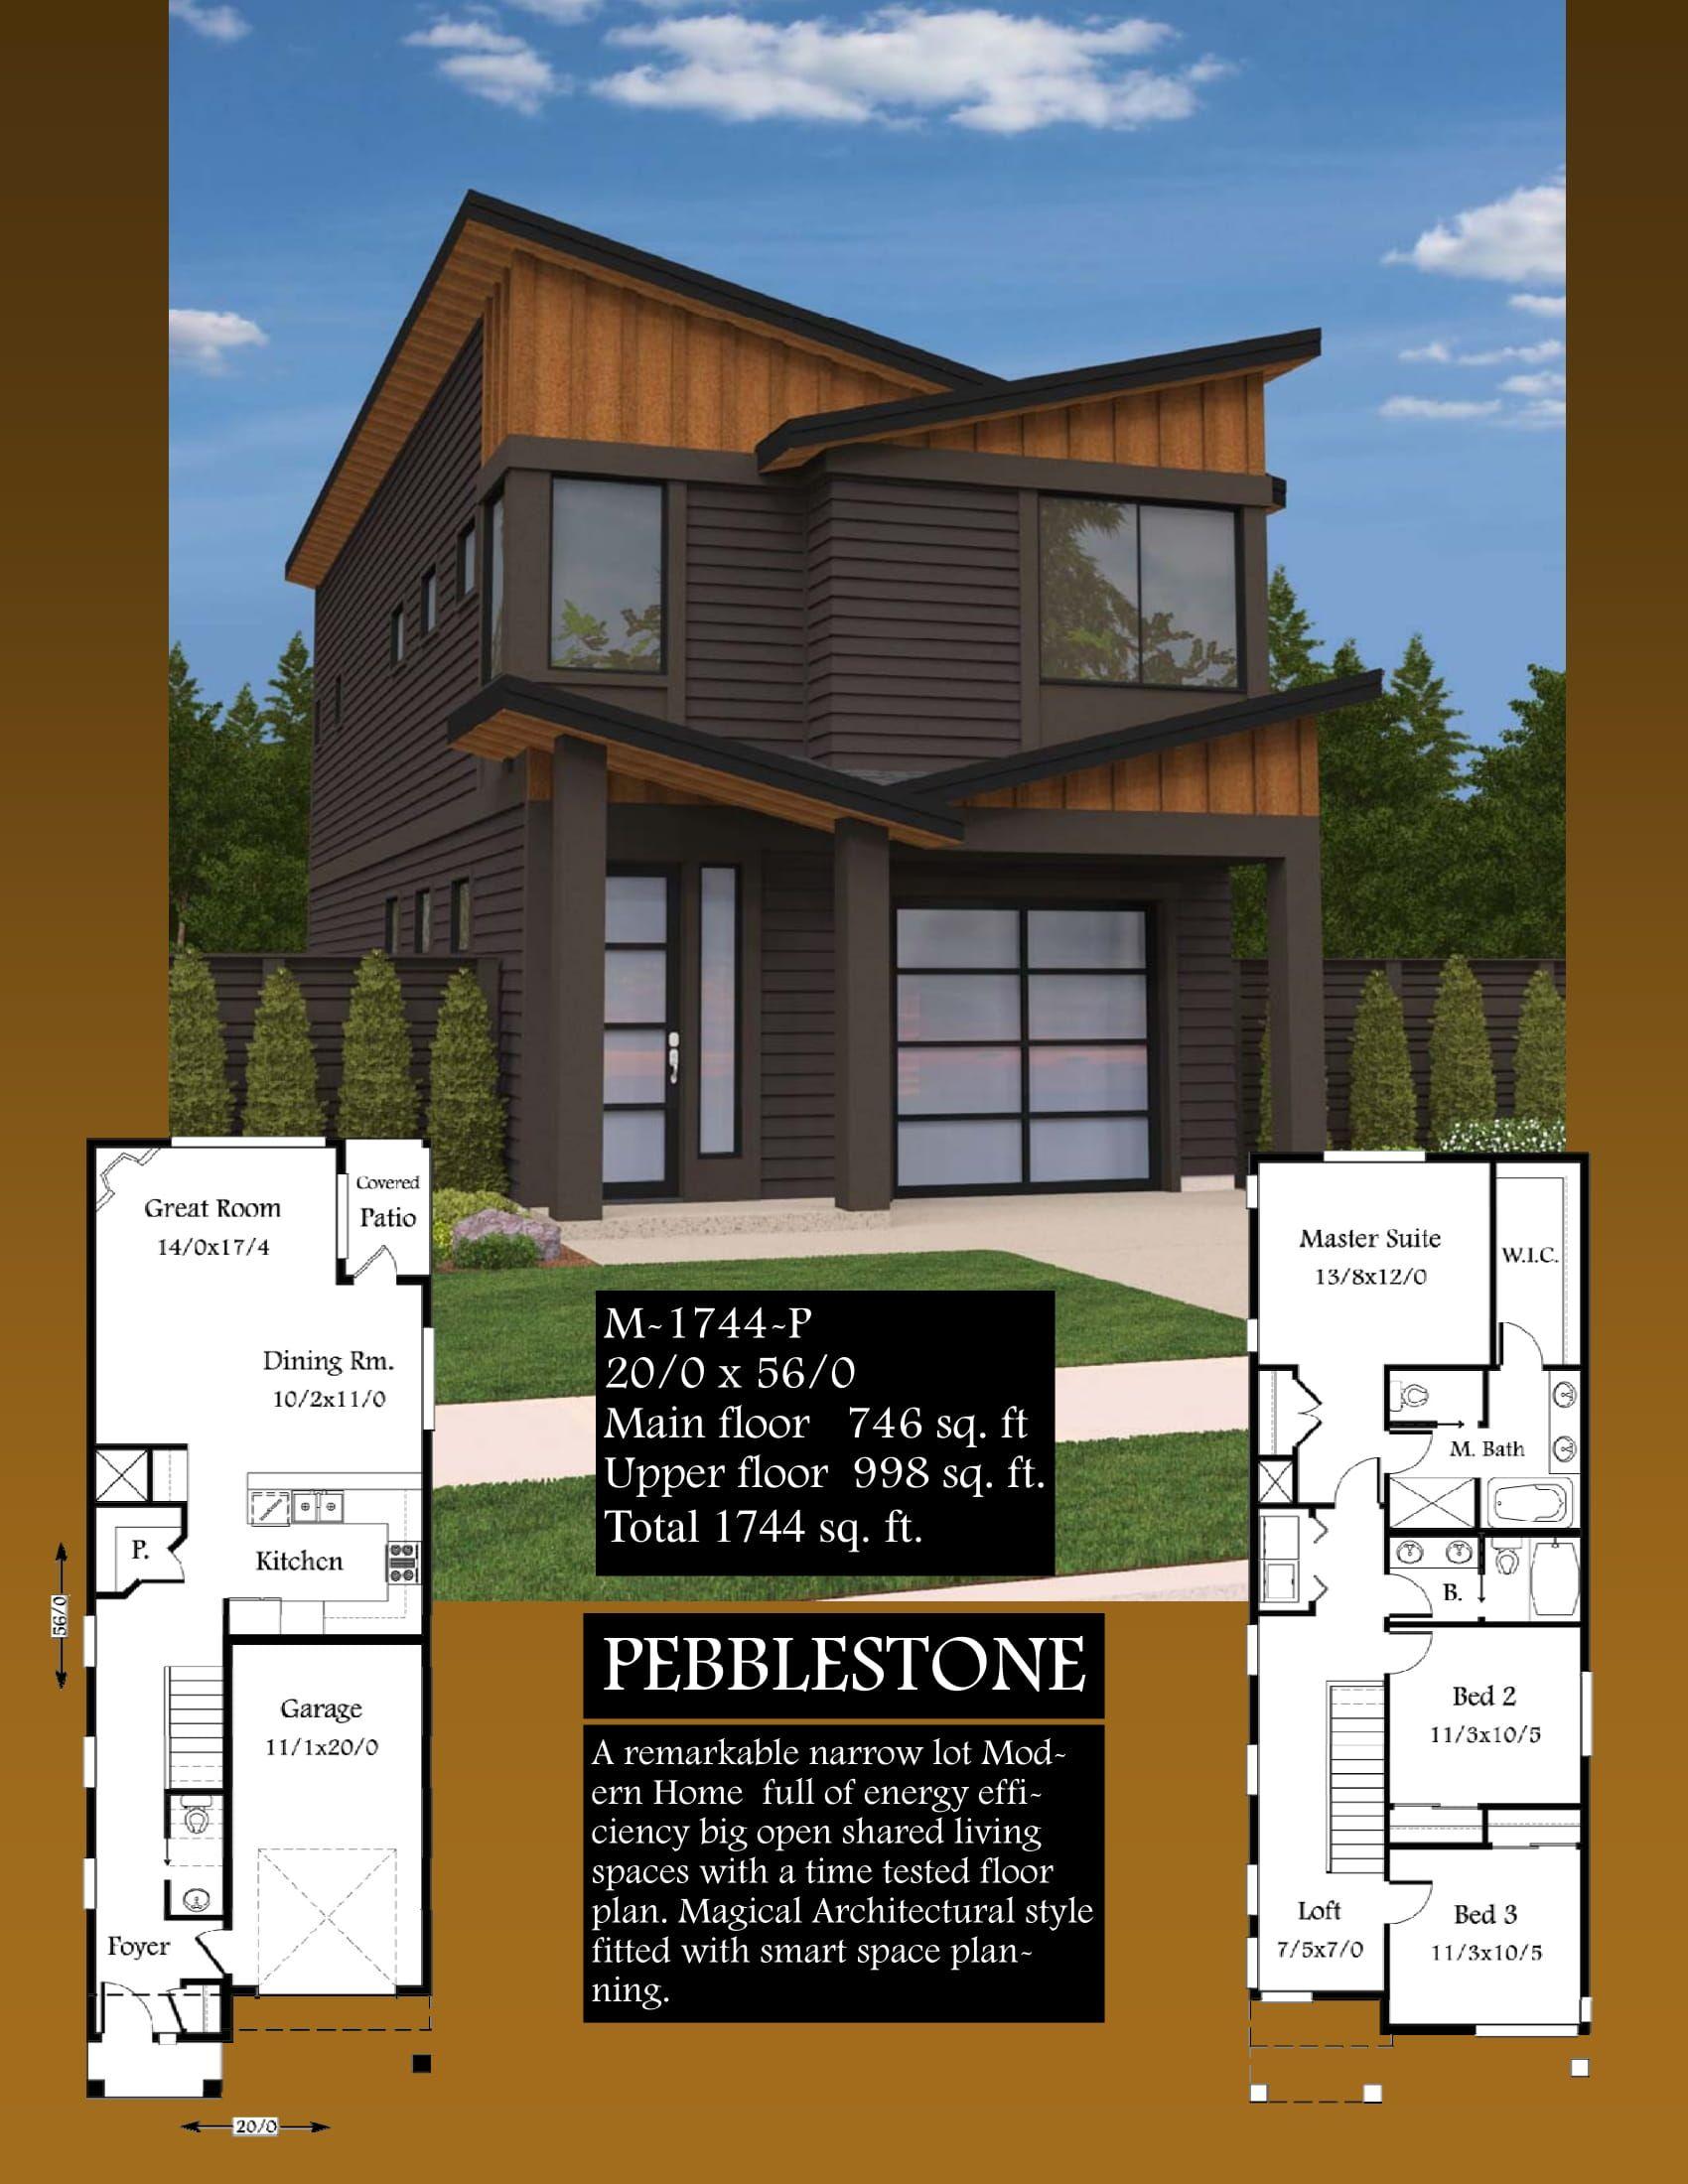 Pebblestone Small House Plan Small House Plans Contemporary House Plans Minimalist House Design